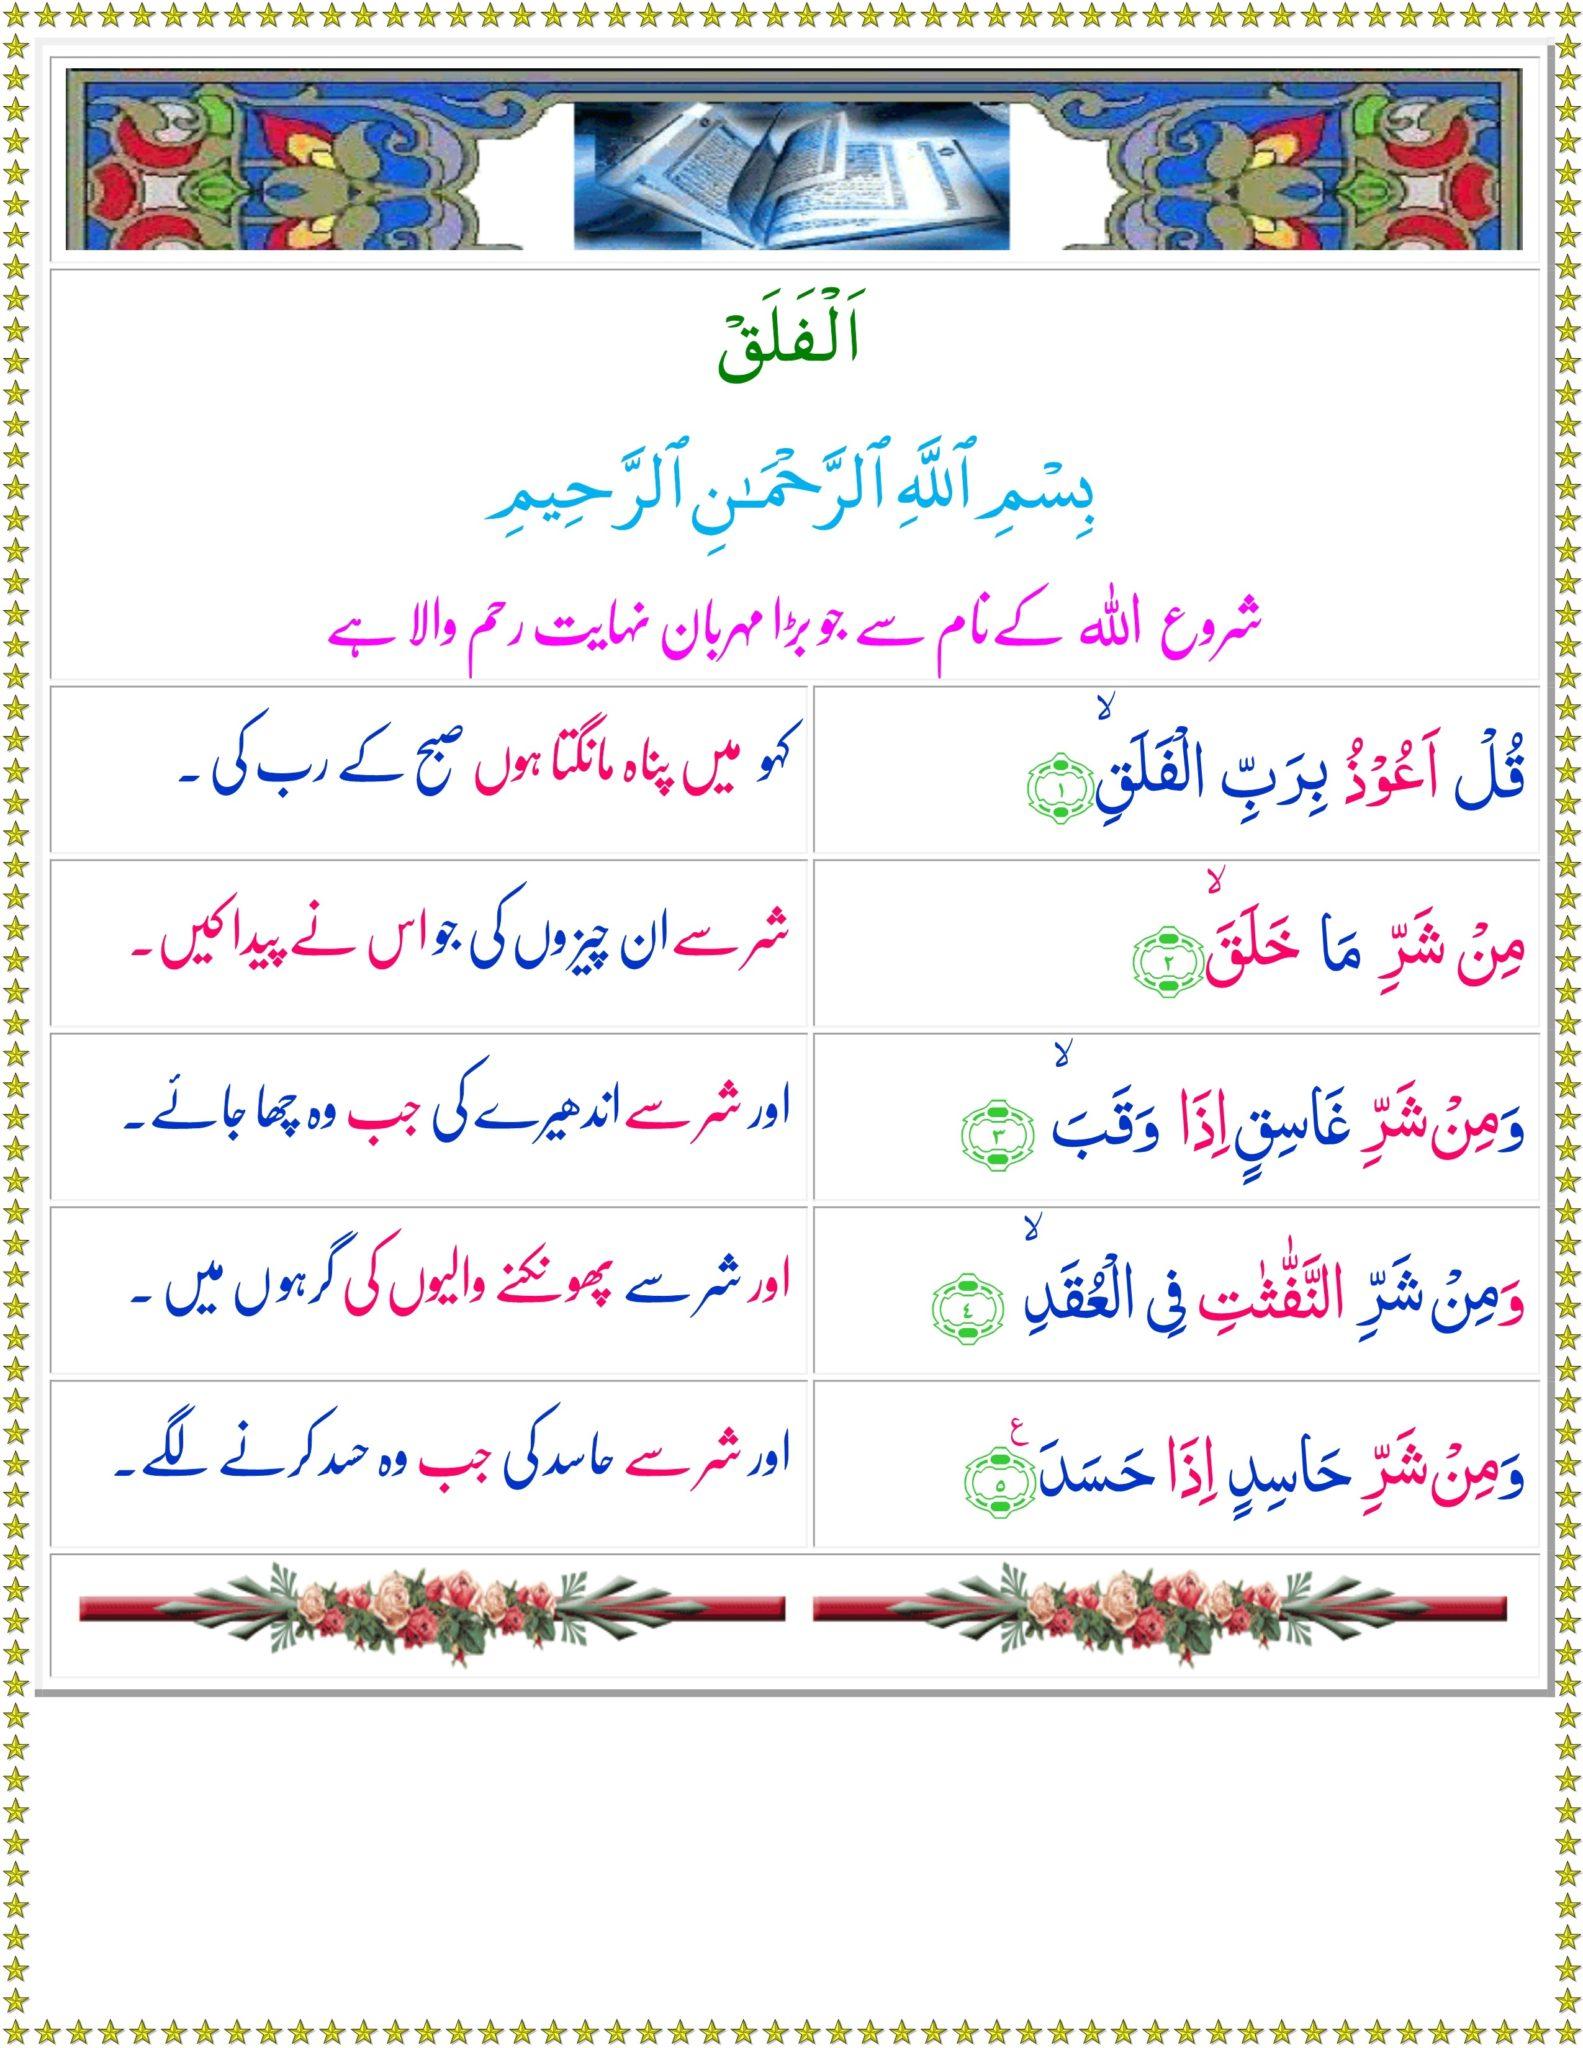 surah Falaq translation in Urdu